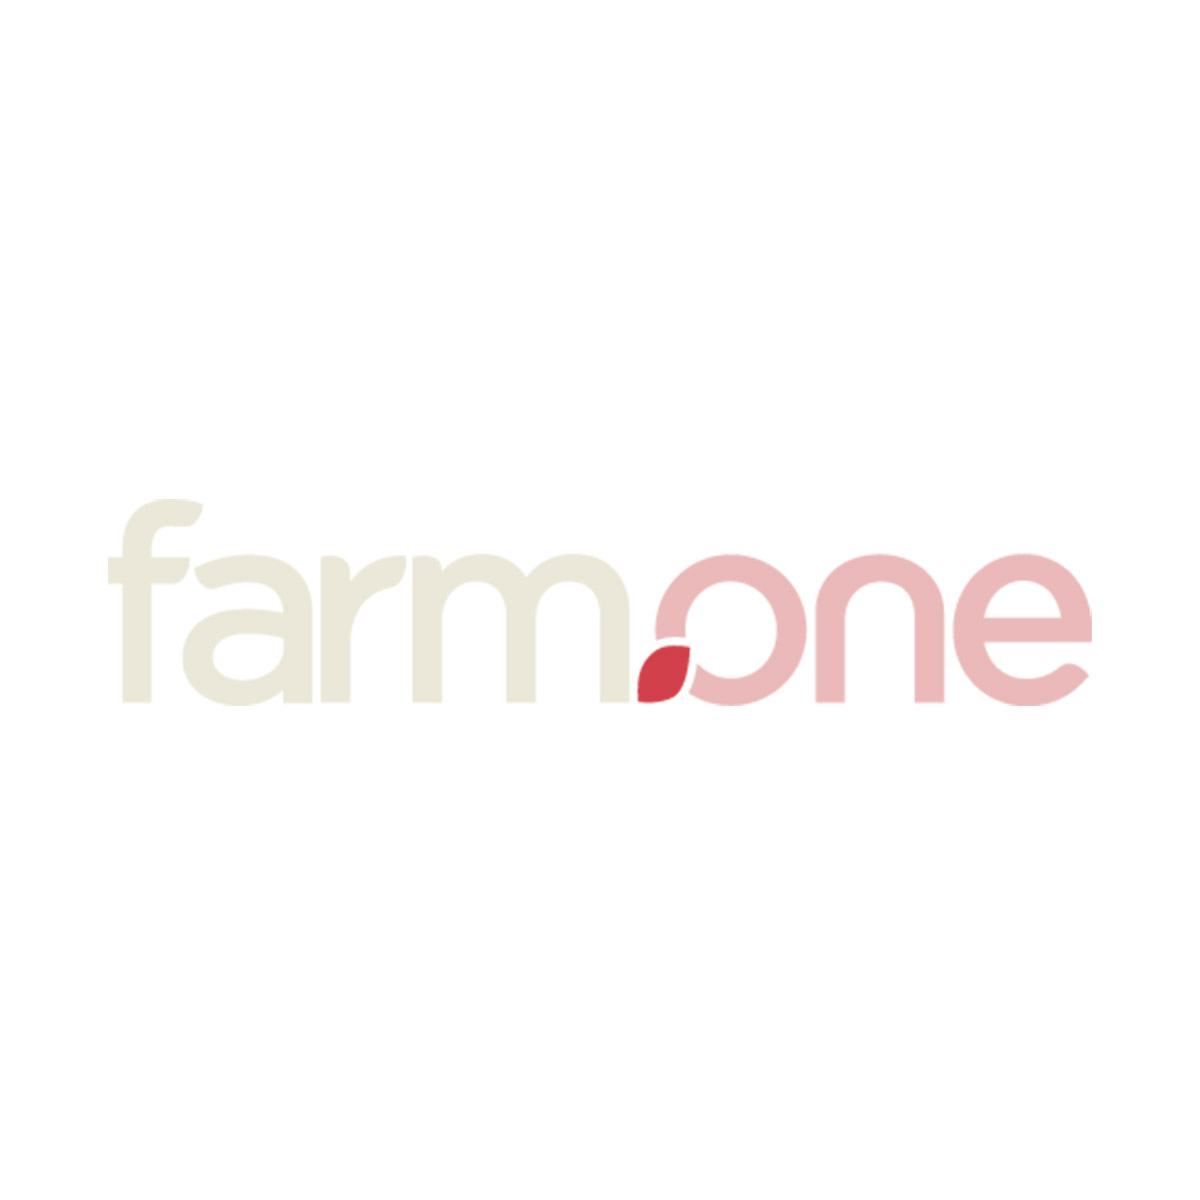 farmone.jpg